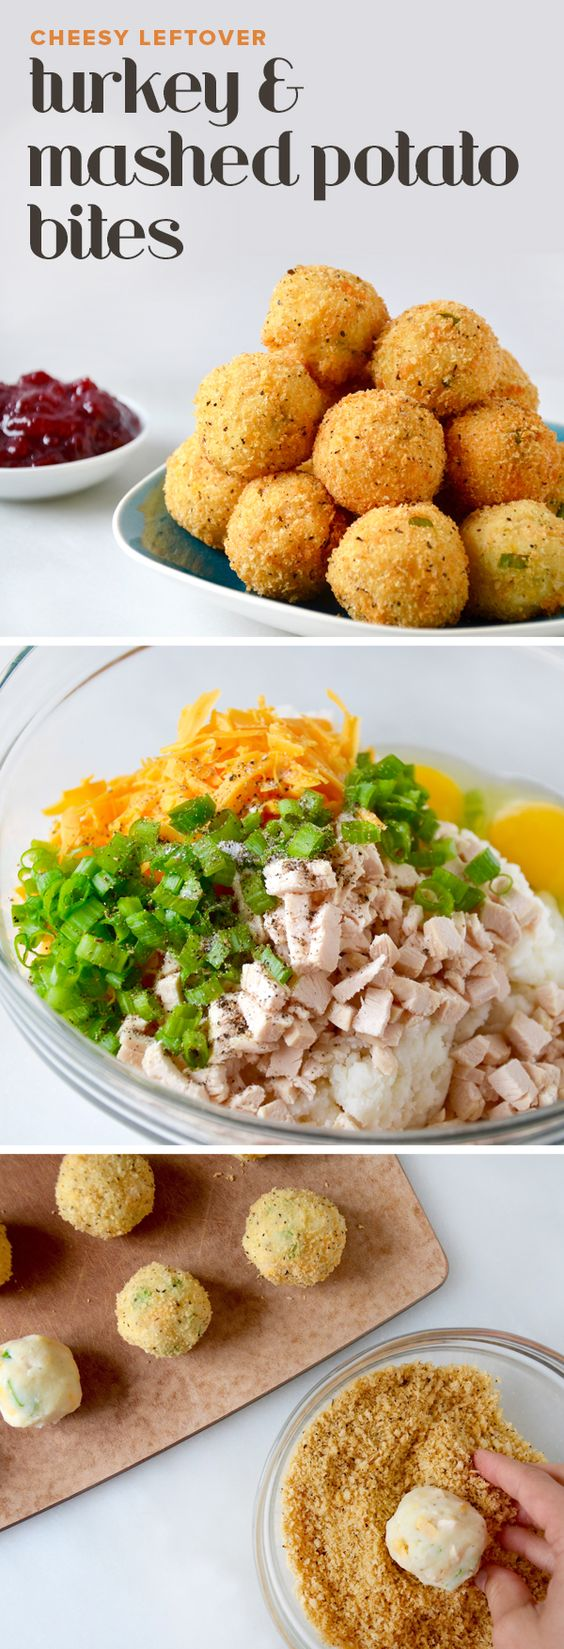 leftover-mashed-potato-bites